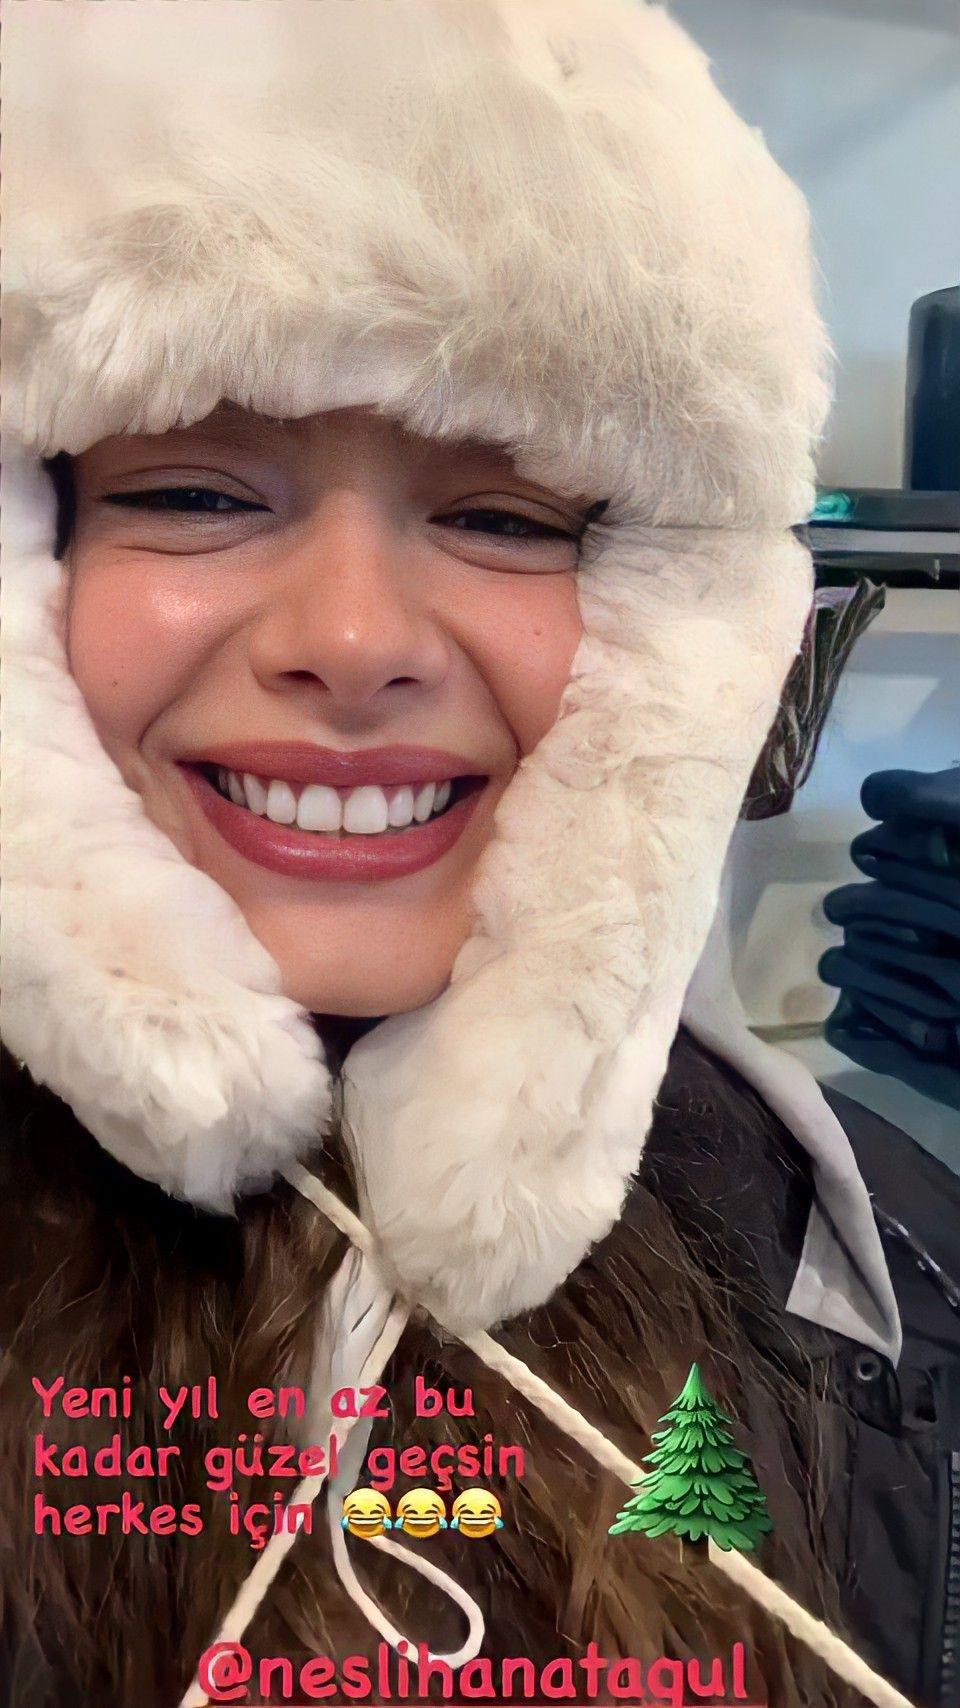 Neslihanatagul Neslihanatagul Kadirdogulu Kadirdogulu Nermac Neskad Sefirinkizi Narecelebi Nare Kingkadir Hatemoglub In 2021 Winter Hats Kiernan Shipka Hats